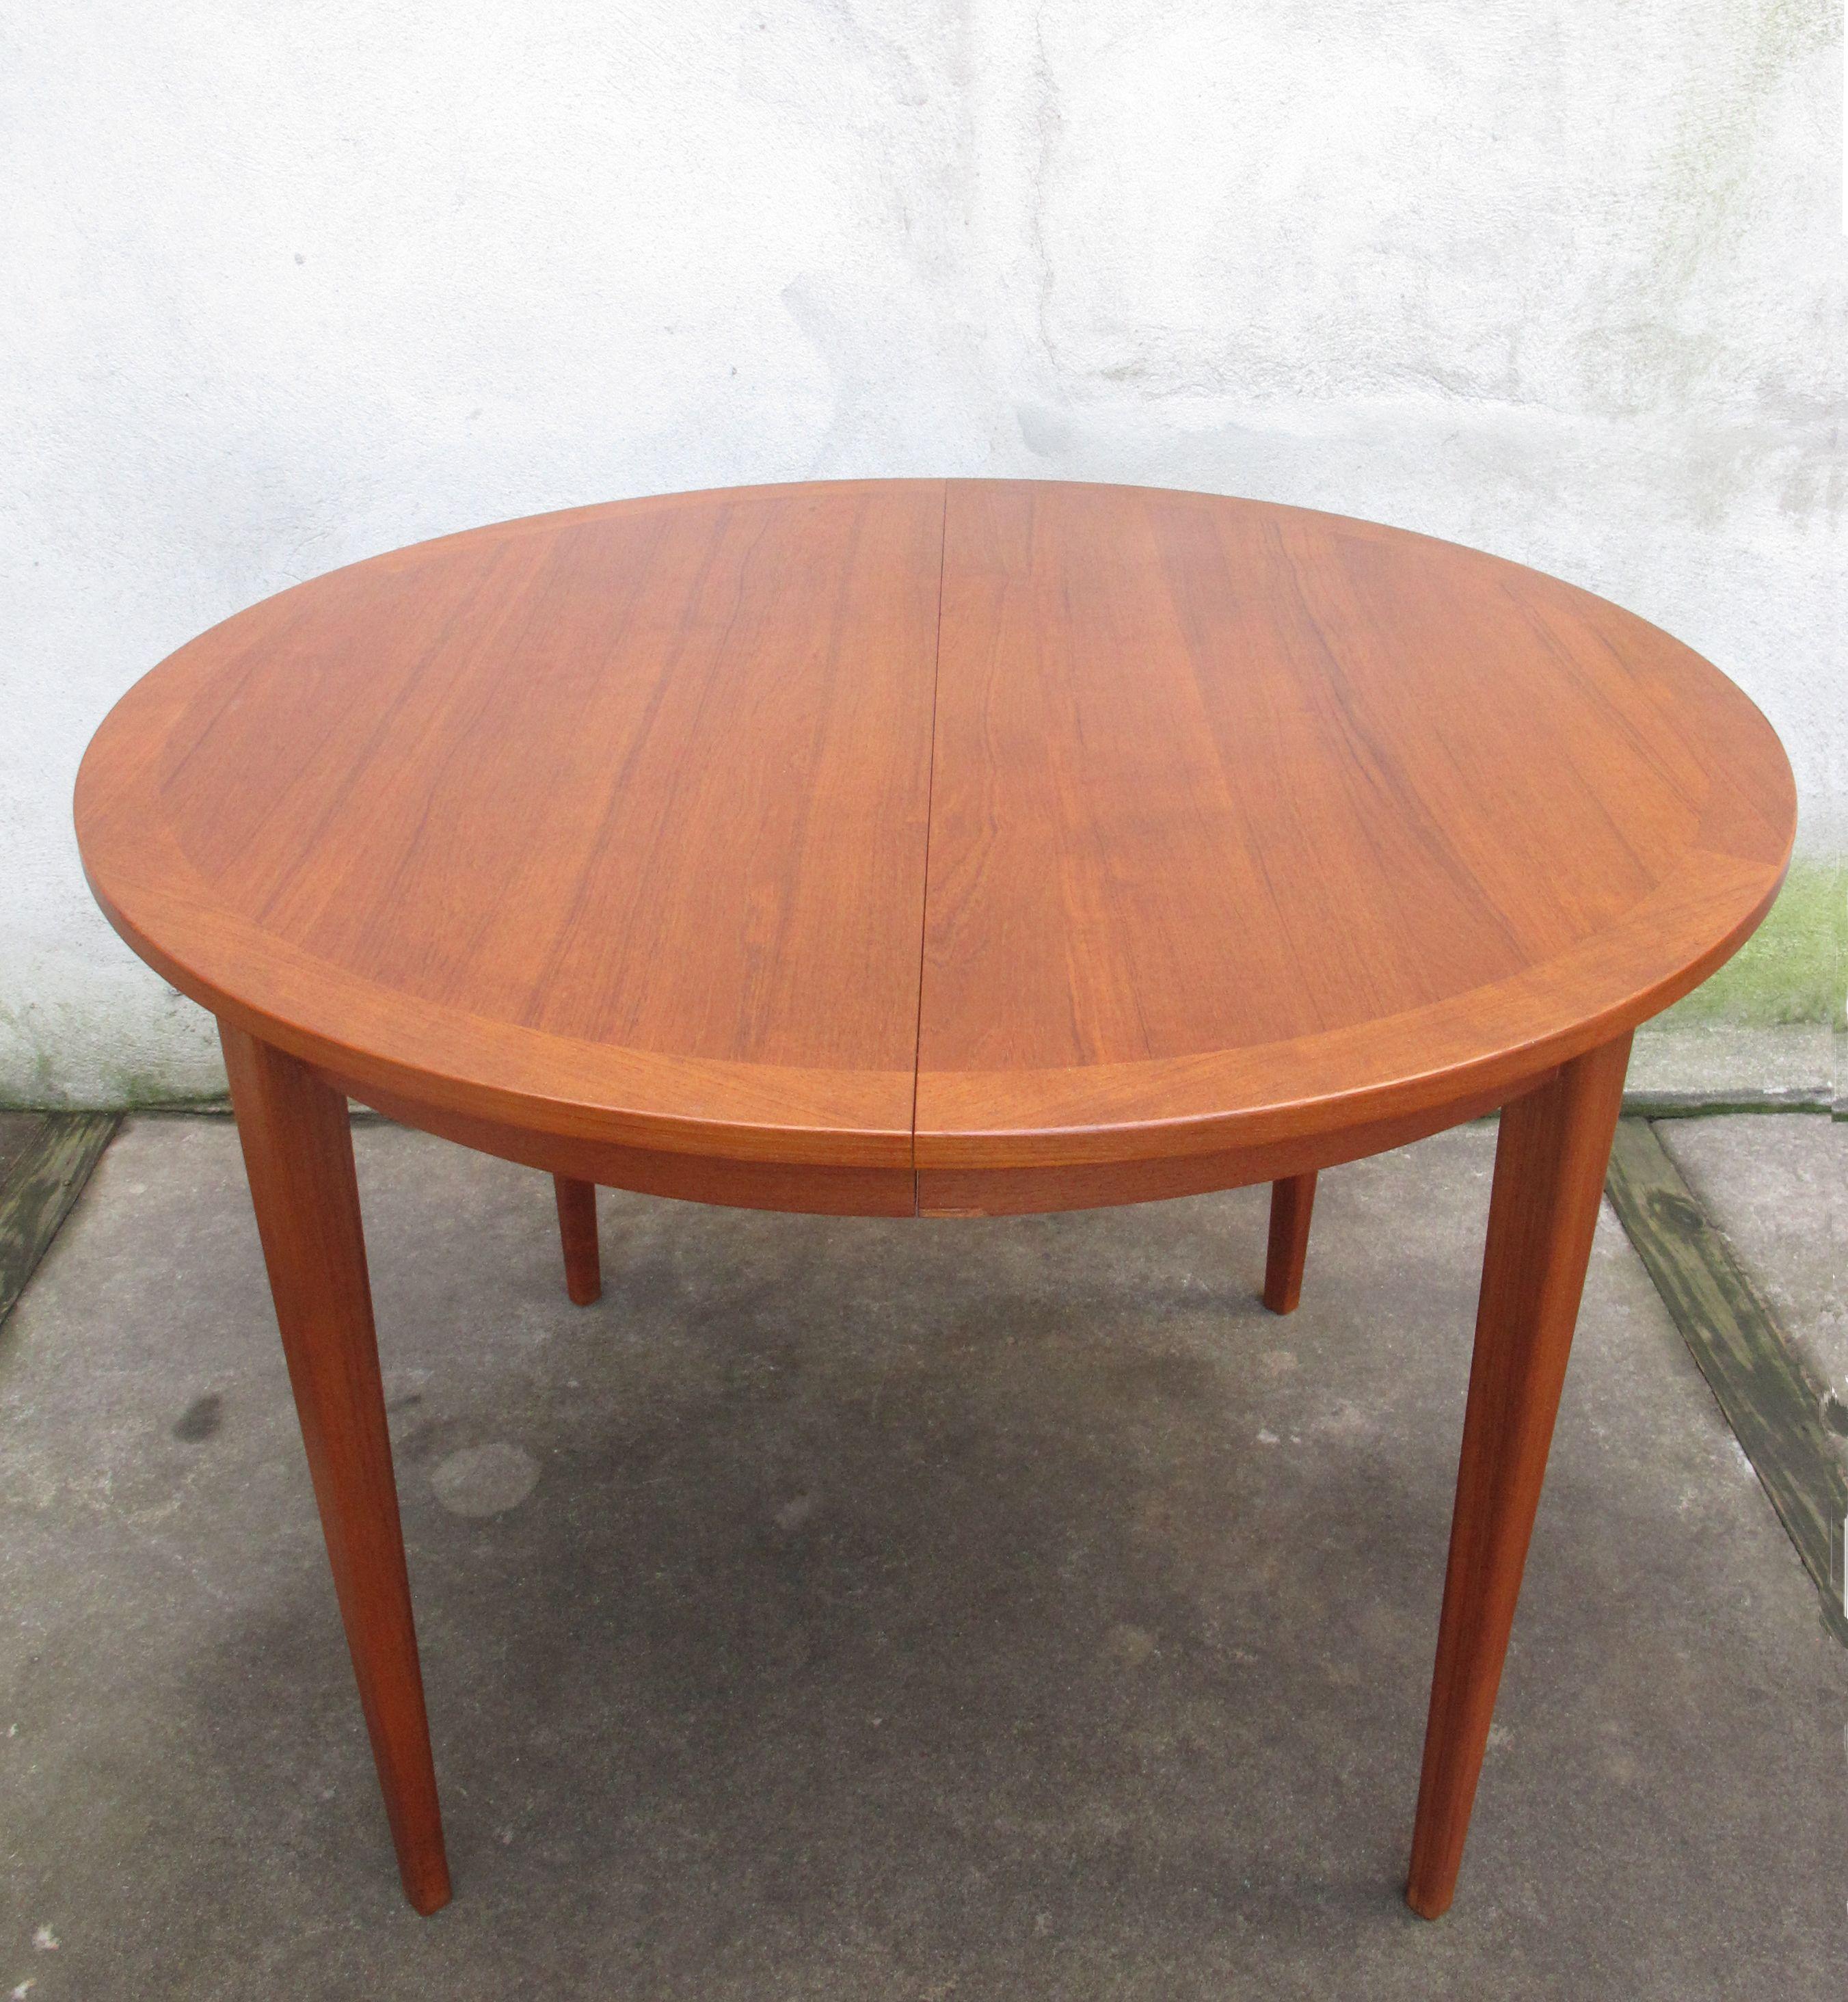 Swedish Modern Round Teak Dining Table Teak Dining Table Modern Furniture Dining Table